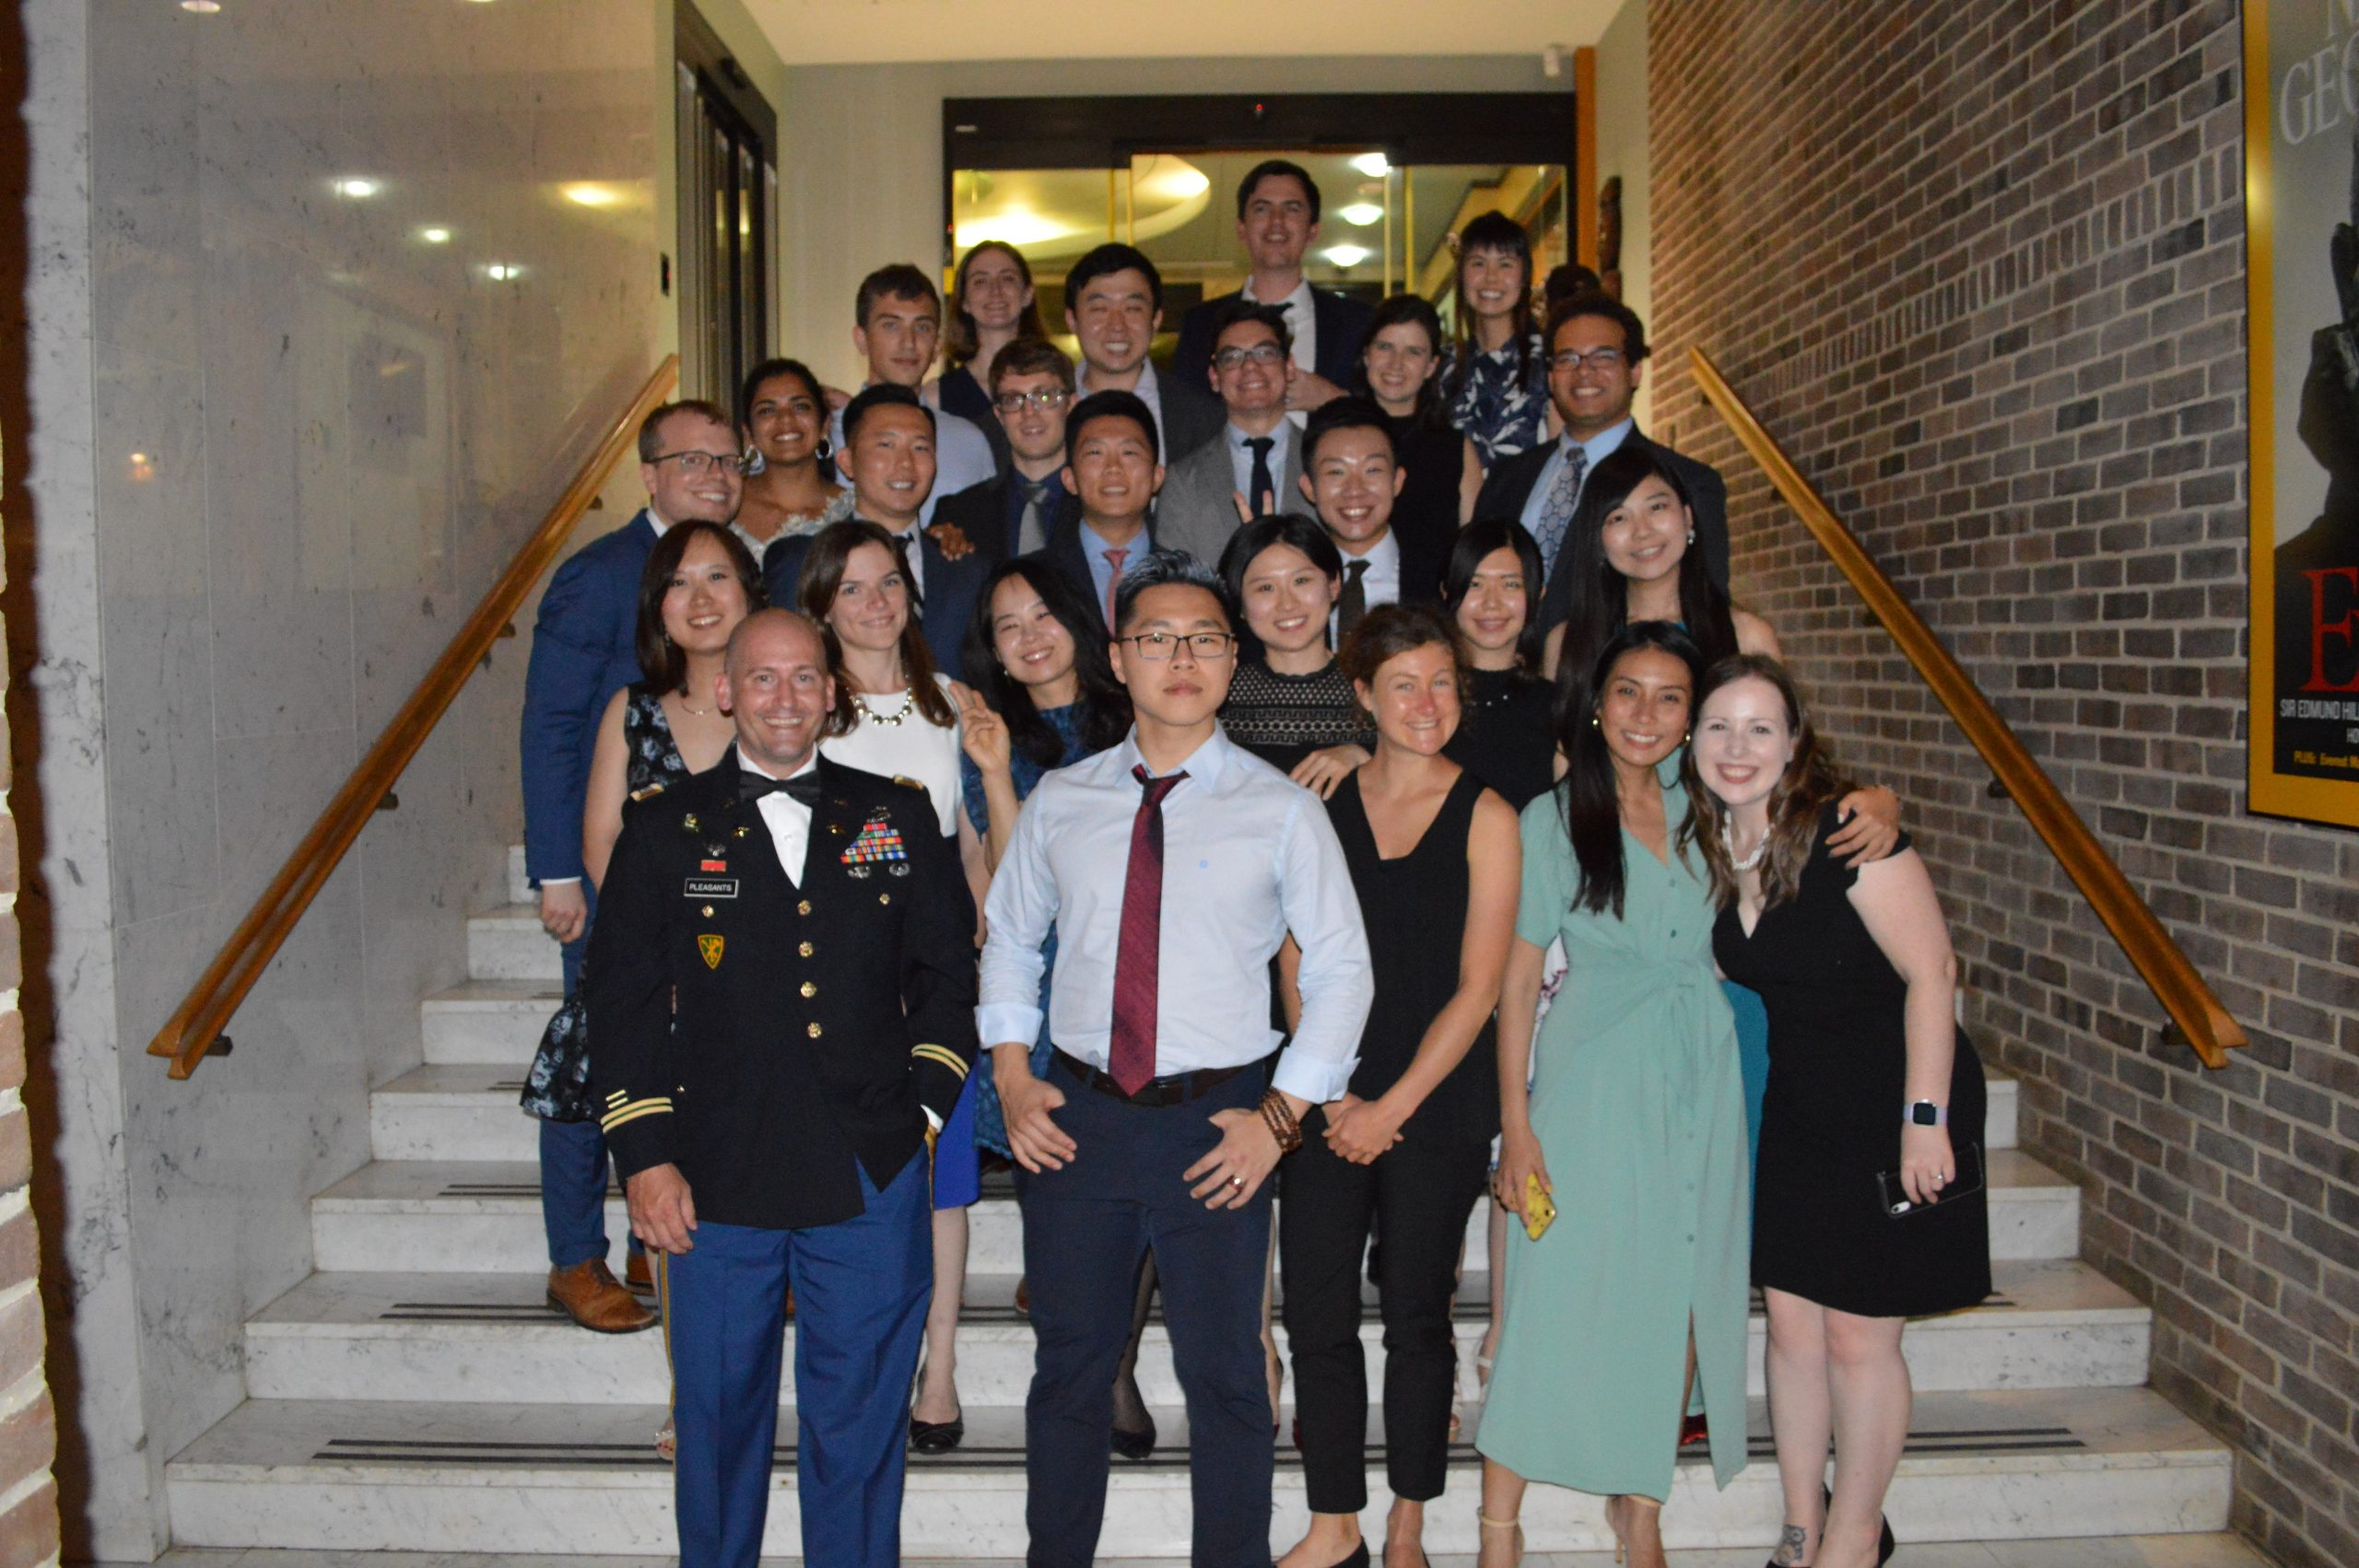 MASIA students pose at graduation banquet dinner